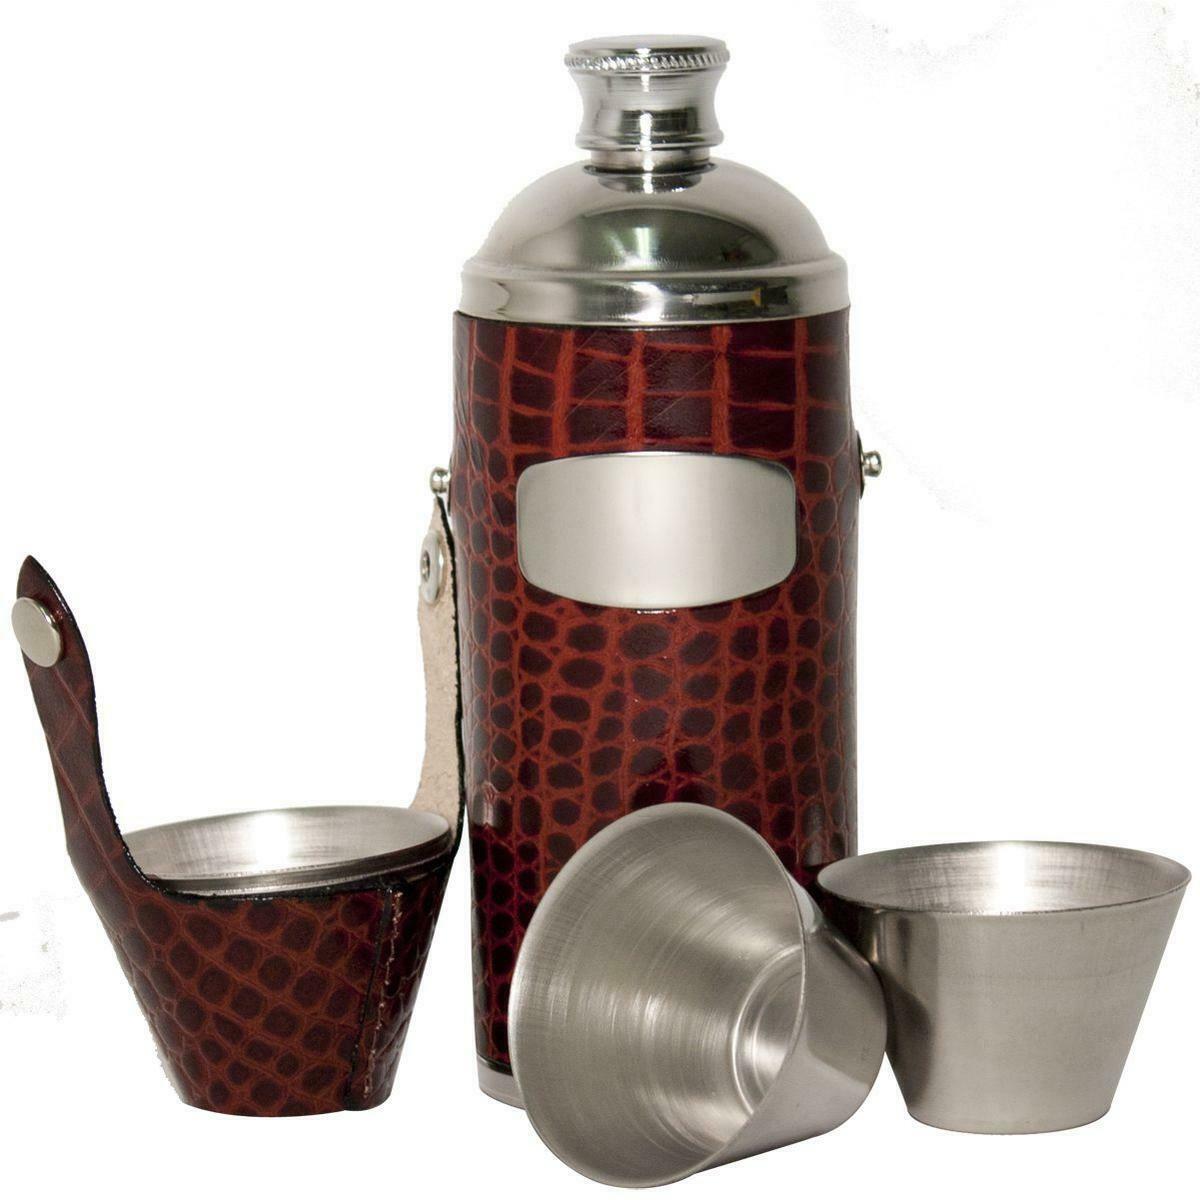 Bisley Brown Croc Leather 8oz Hunters Flask & Cup Set